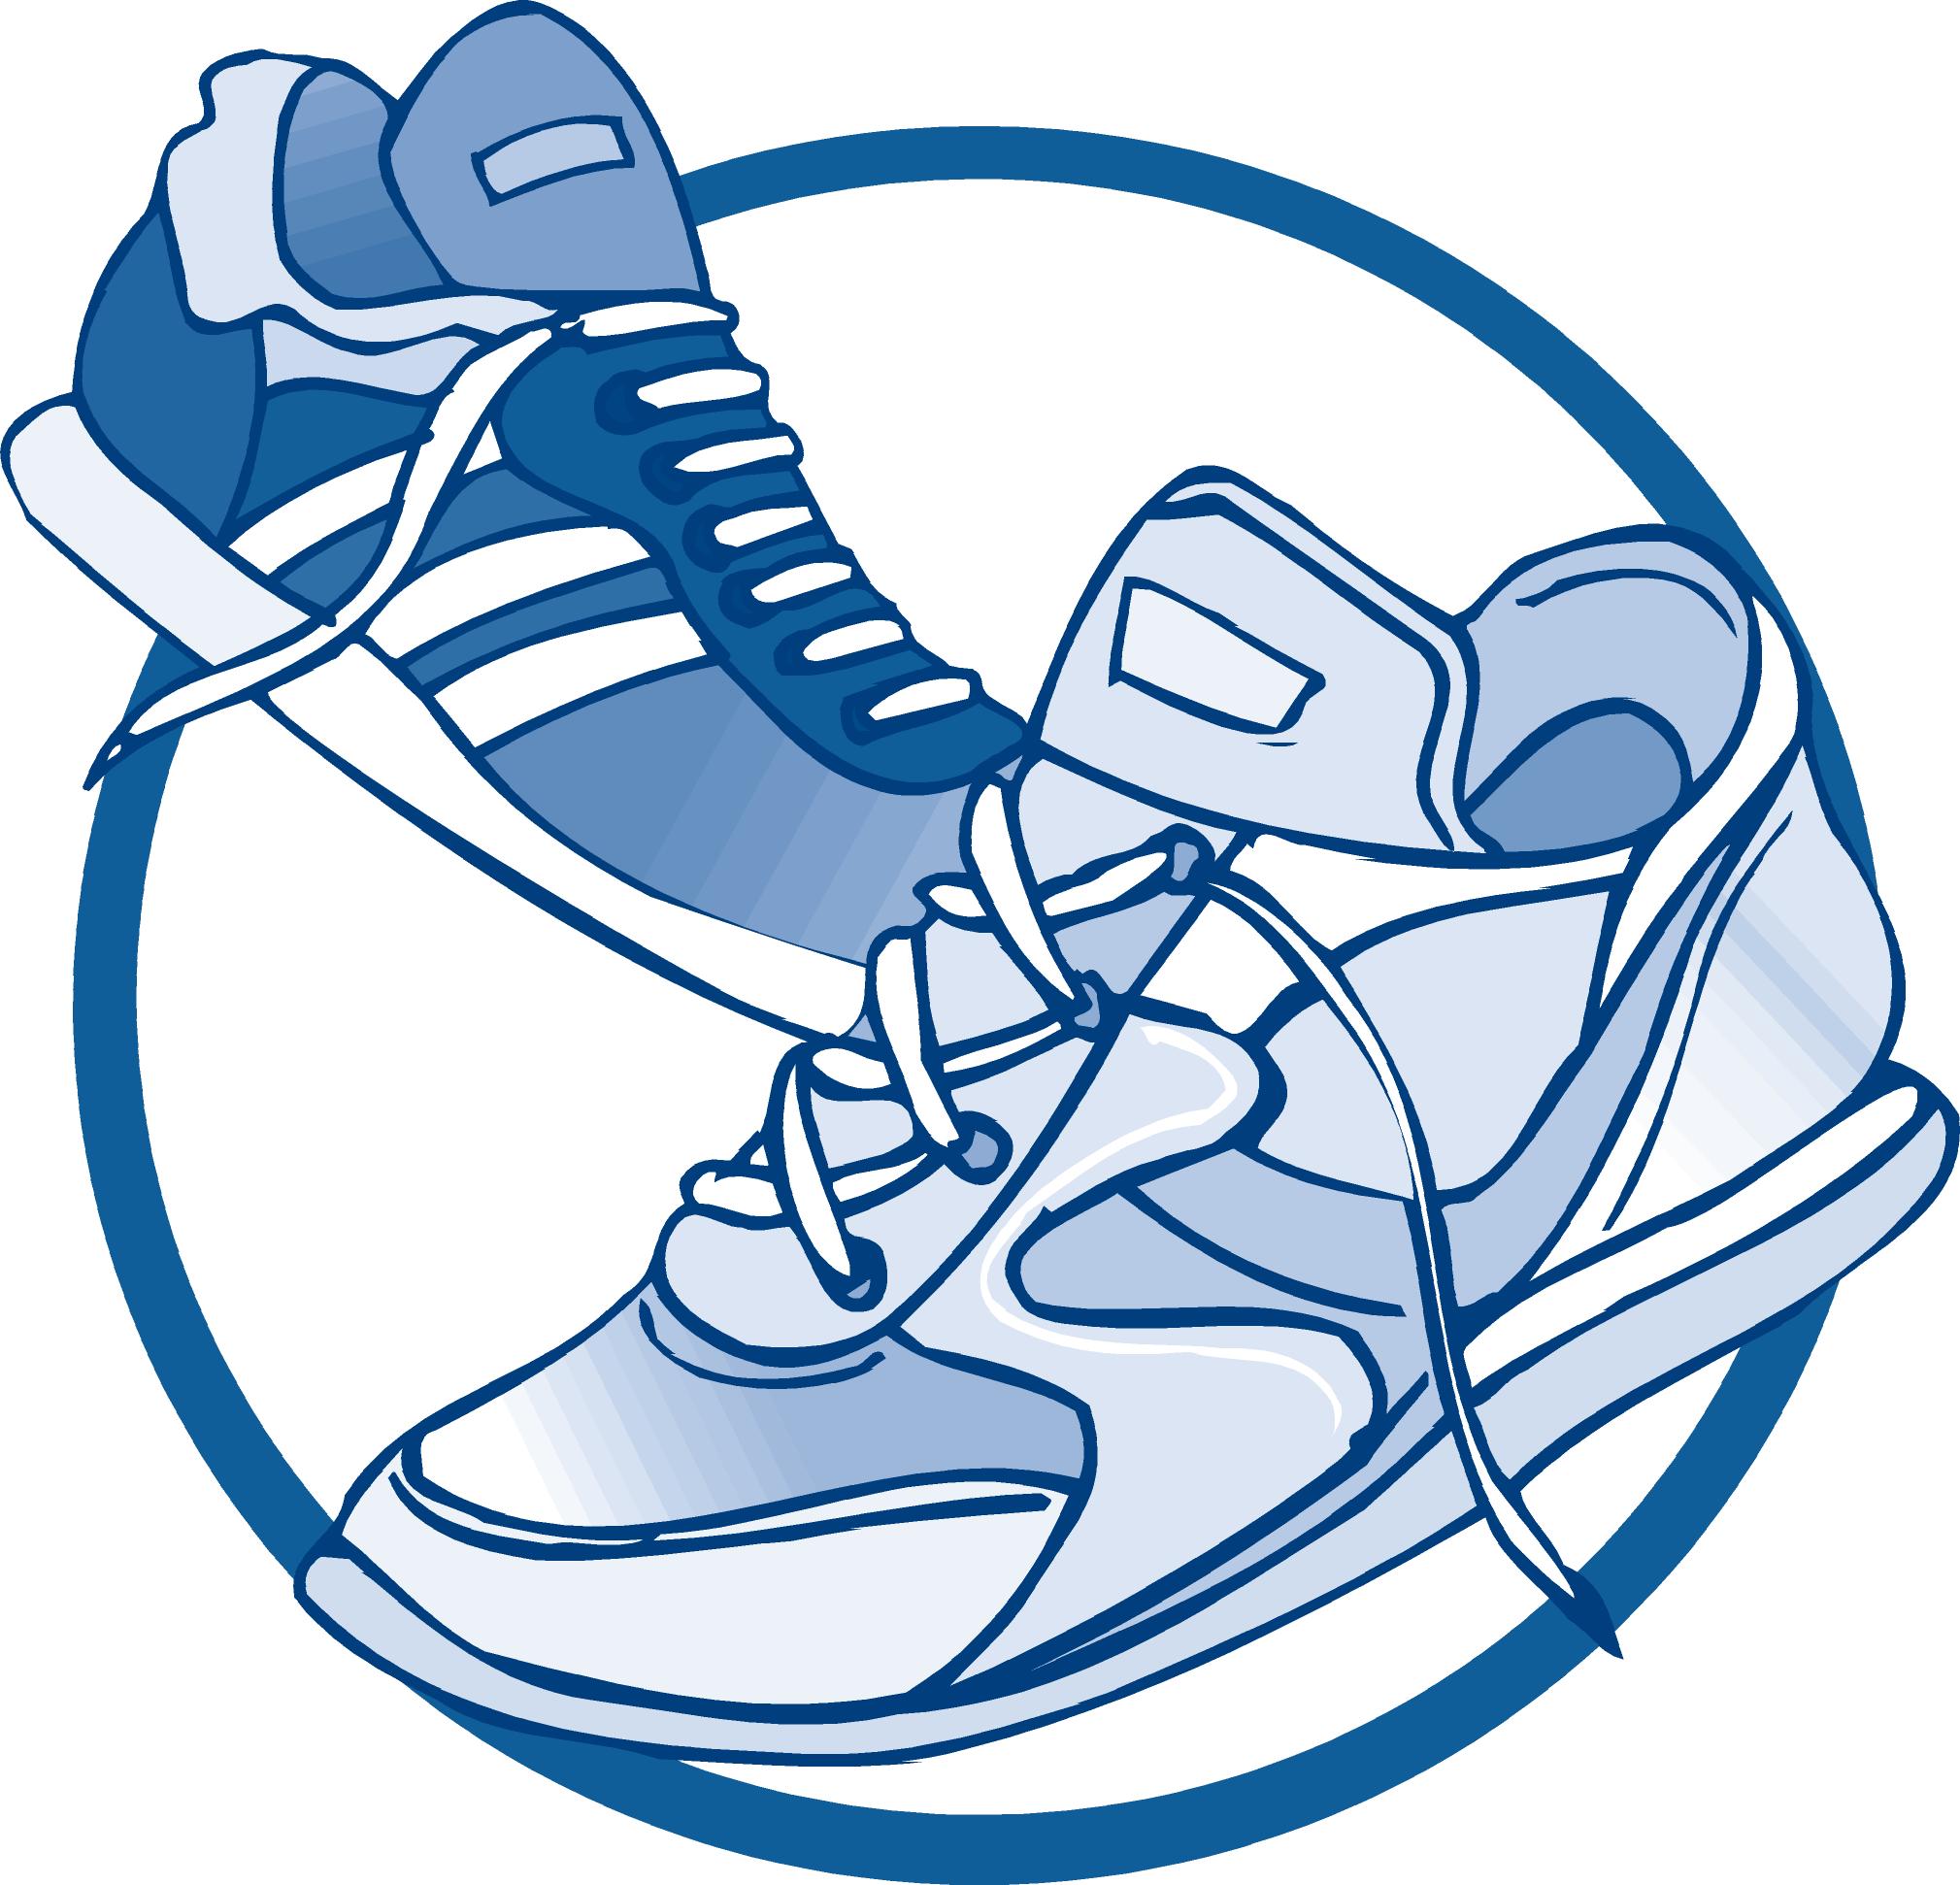 2019x1942 Tennis Shoe Free Shoes Clipart Clip Art Of 7 Clipartwork